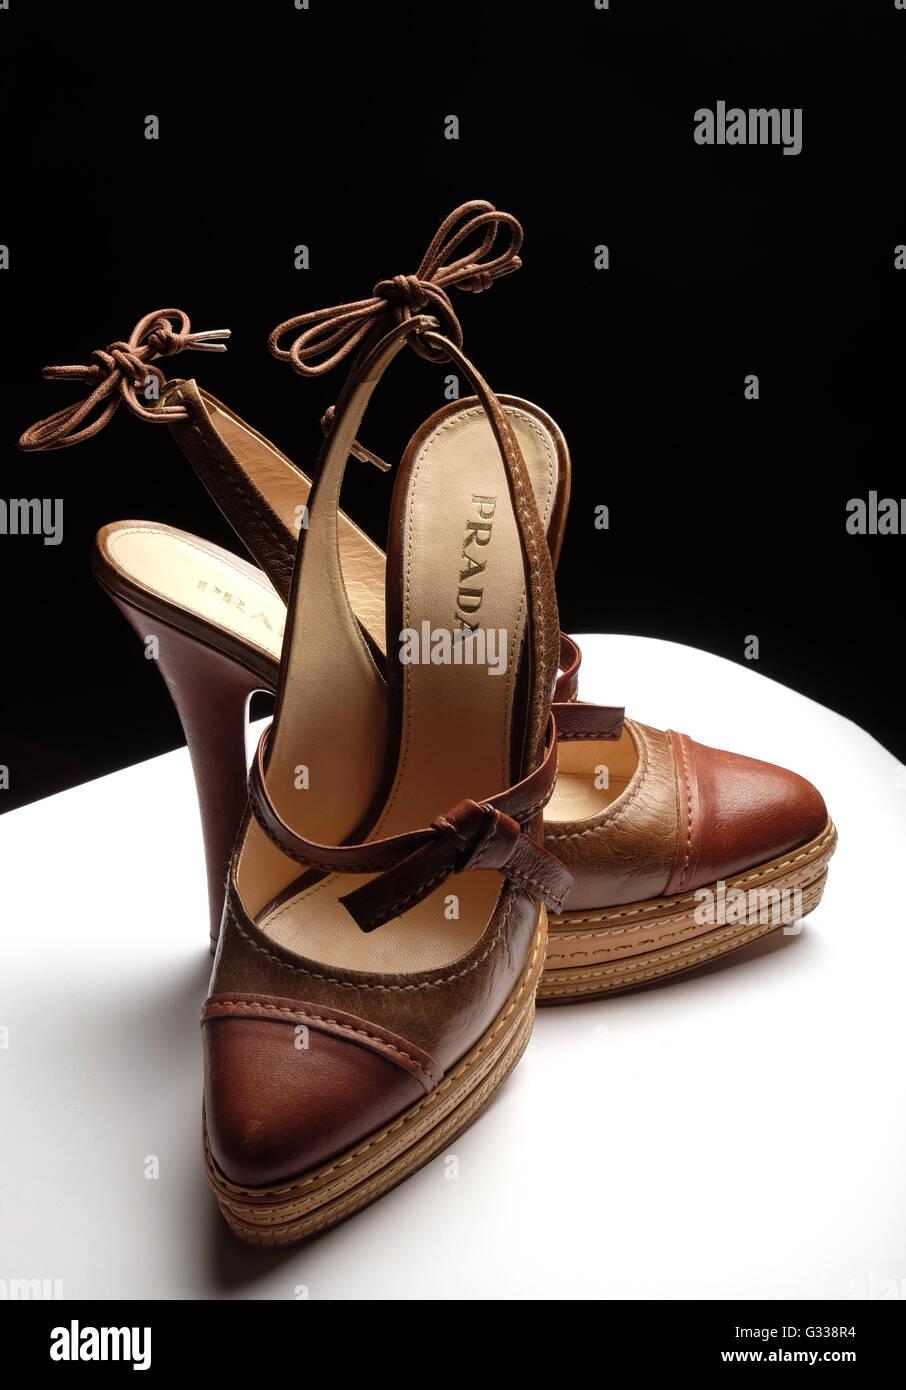 Classic hand-made Italian designer Prada shoes. Stock Photo